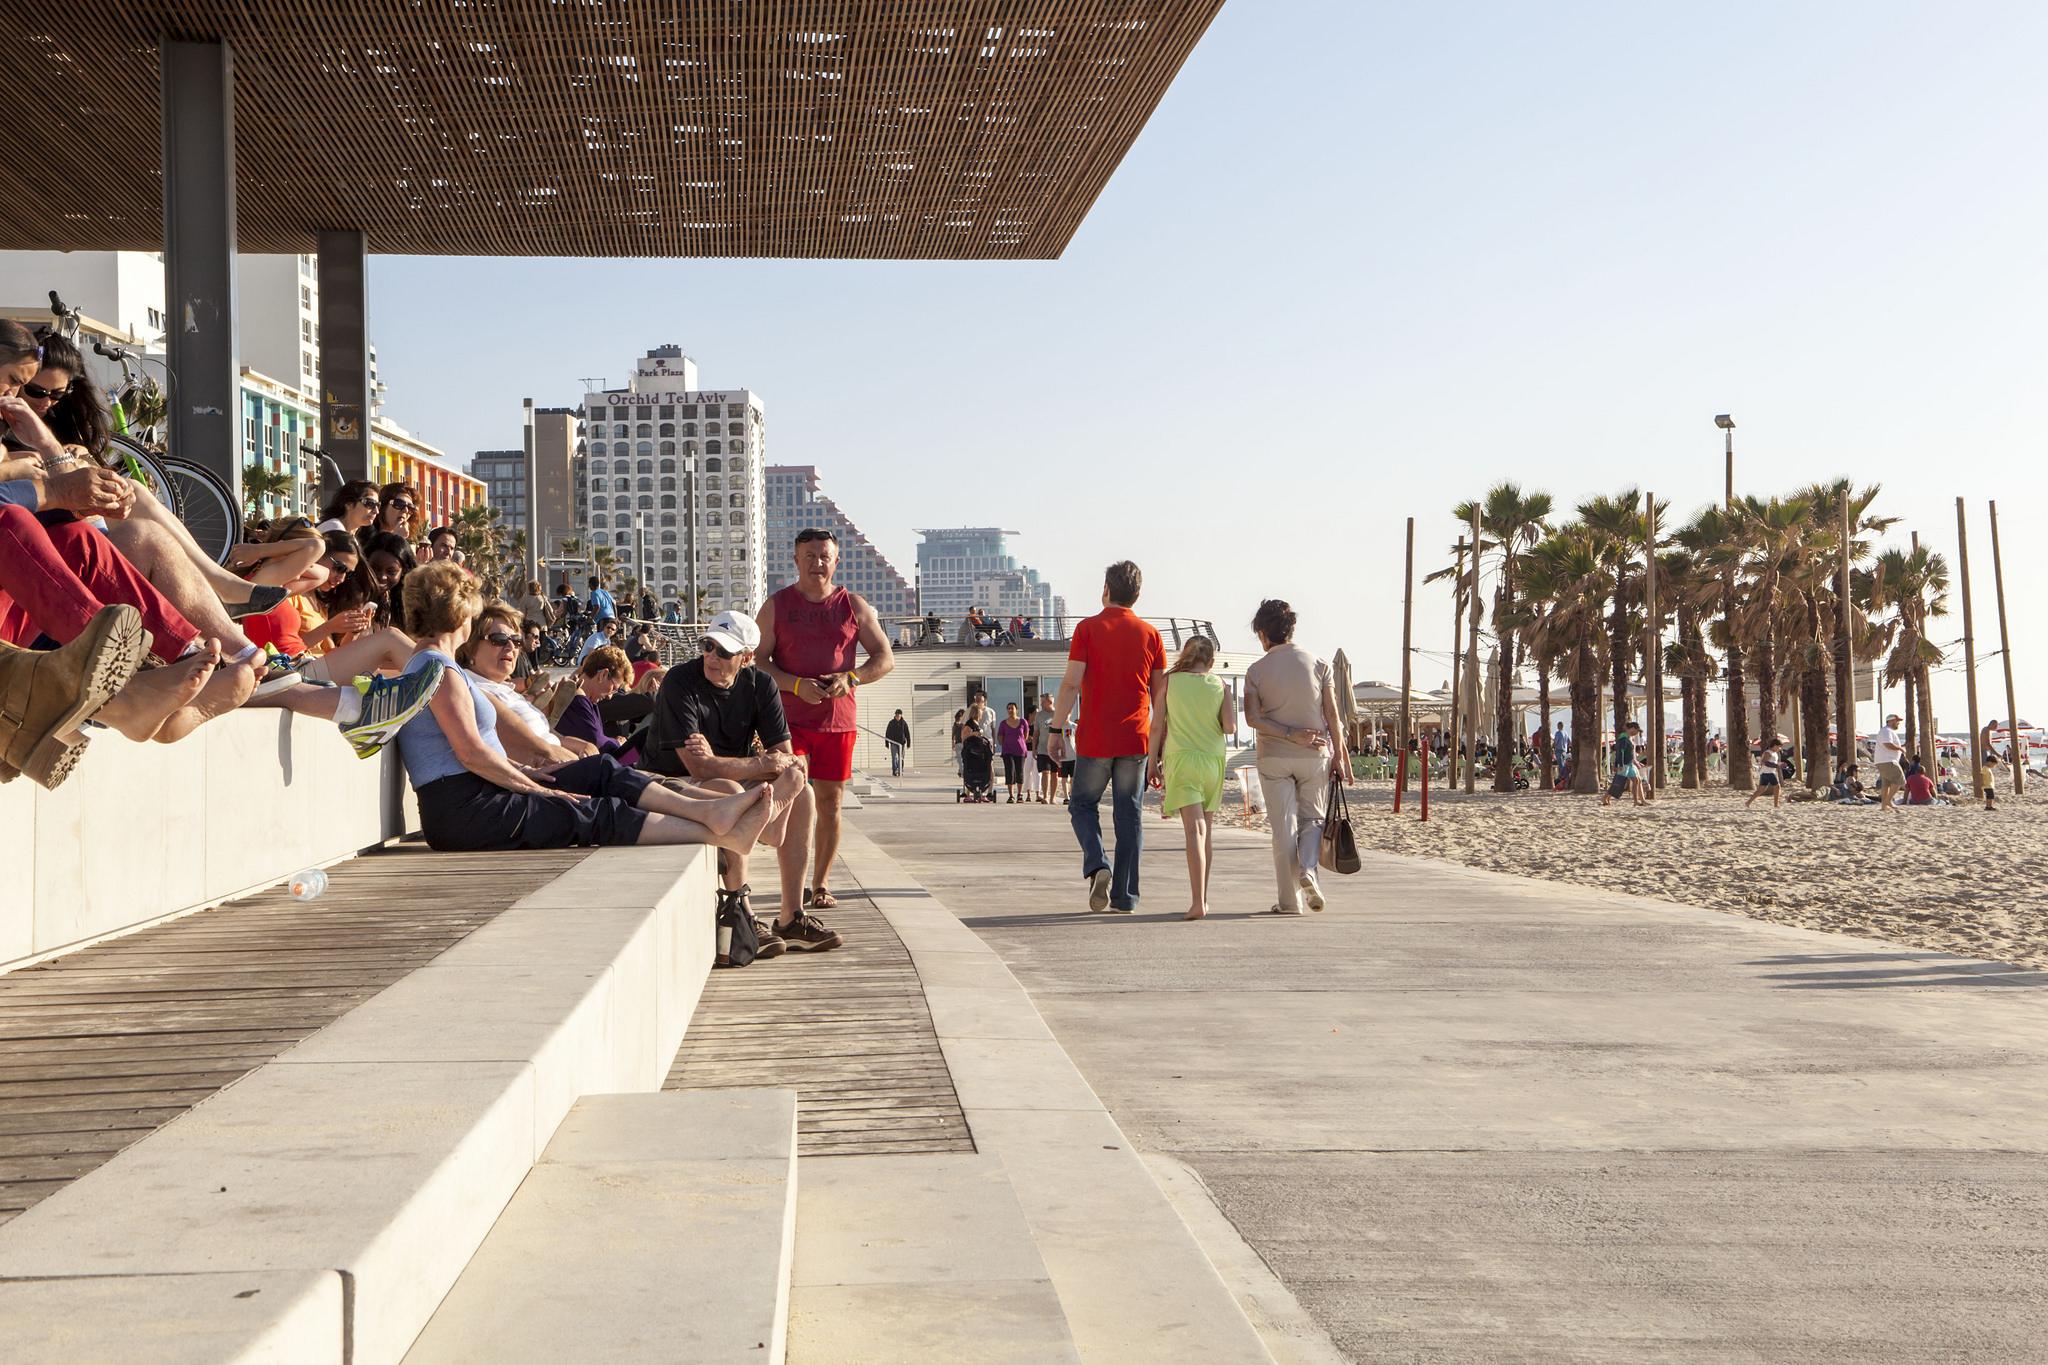 Tel Aviv Update: Beach Renovations Continue In Tel Aviv